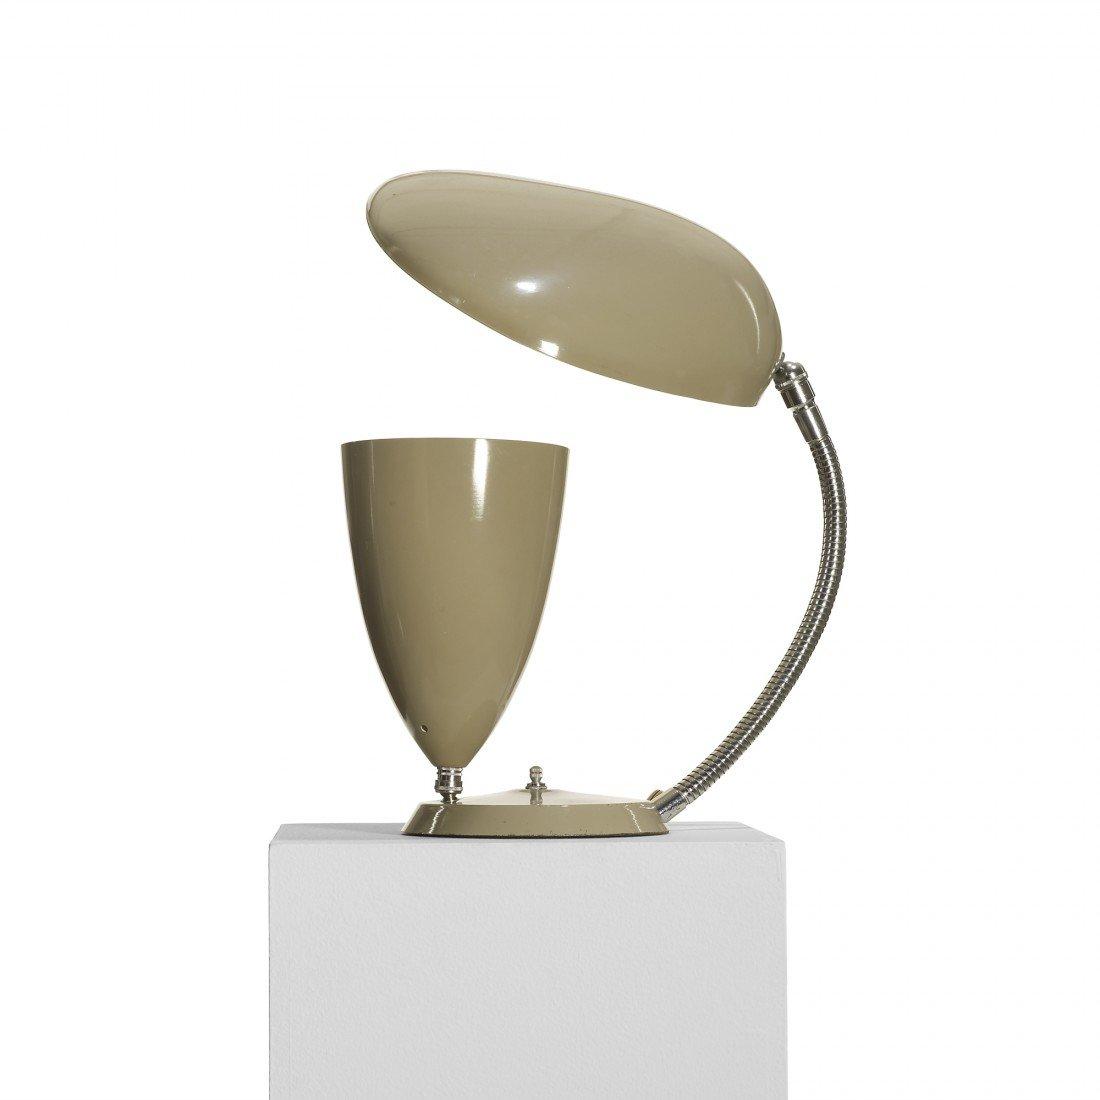 Greta magnusson grossman table lamp 148 greta magnusson grossman table lamp geotapseo Gallery